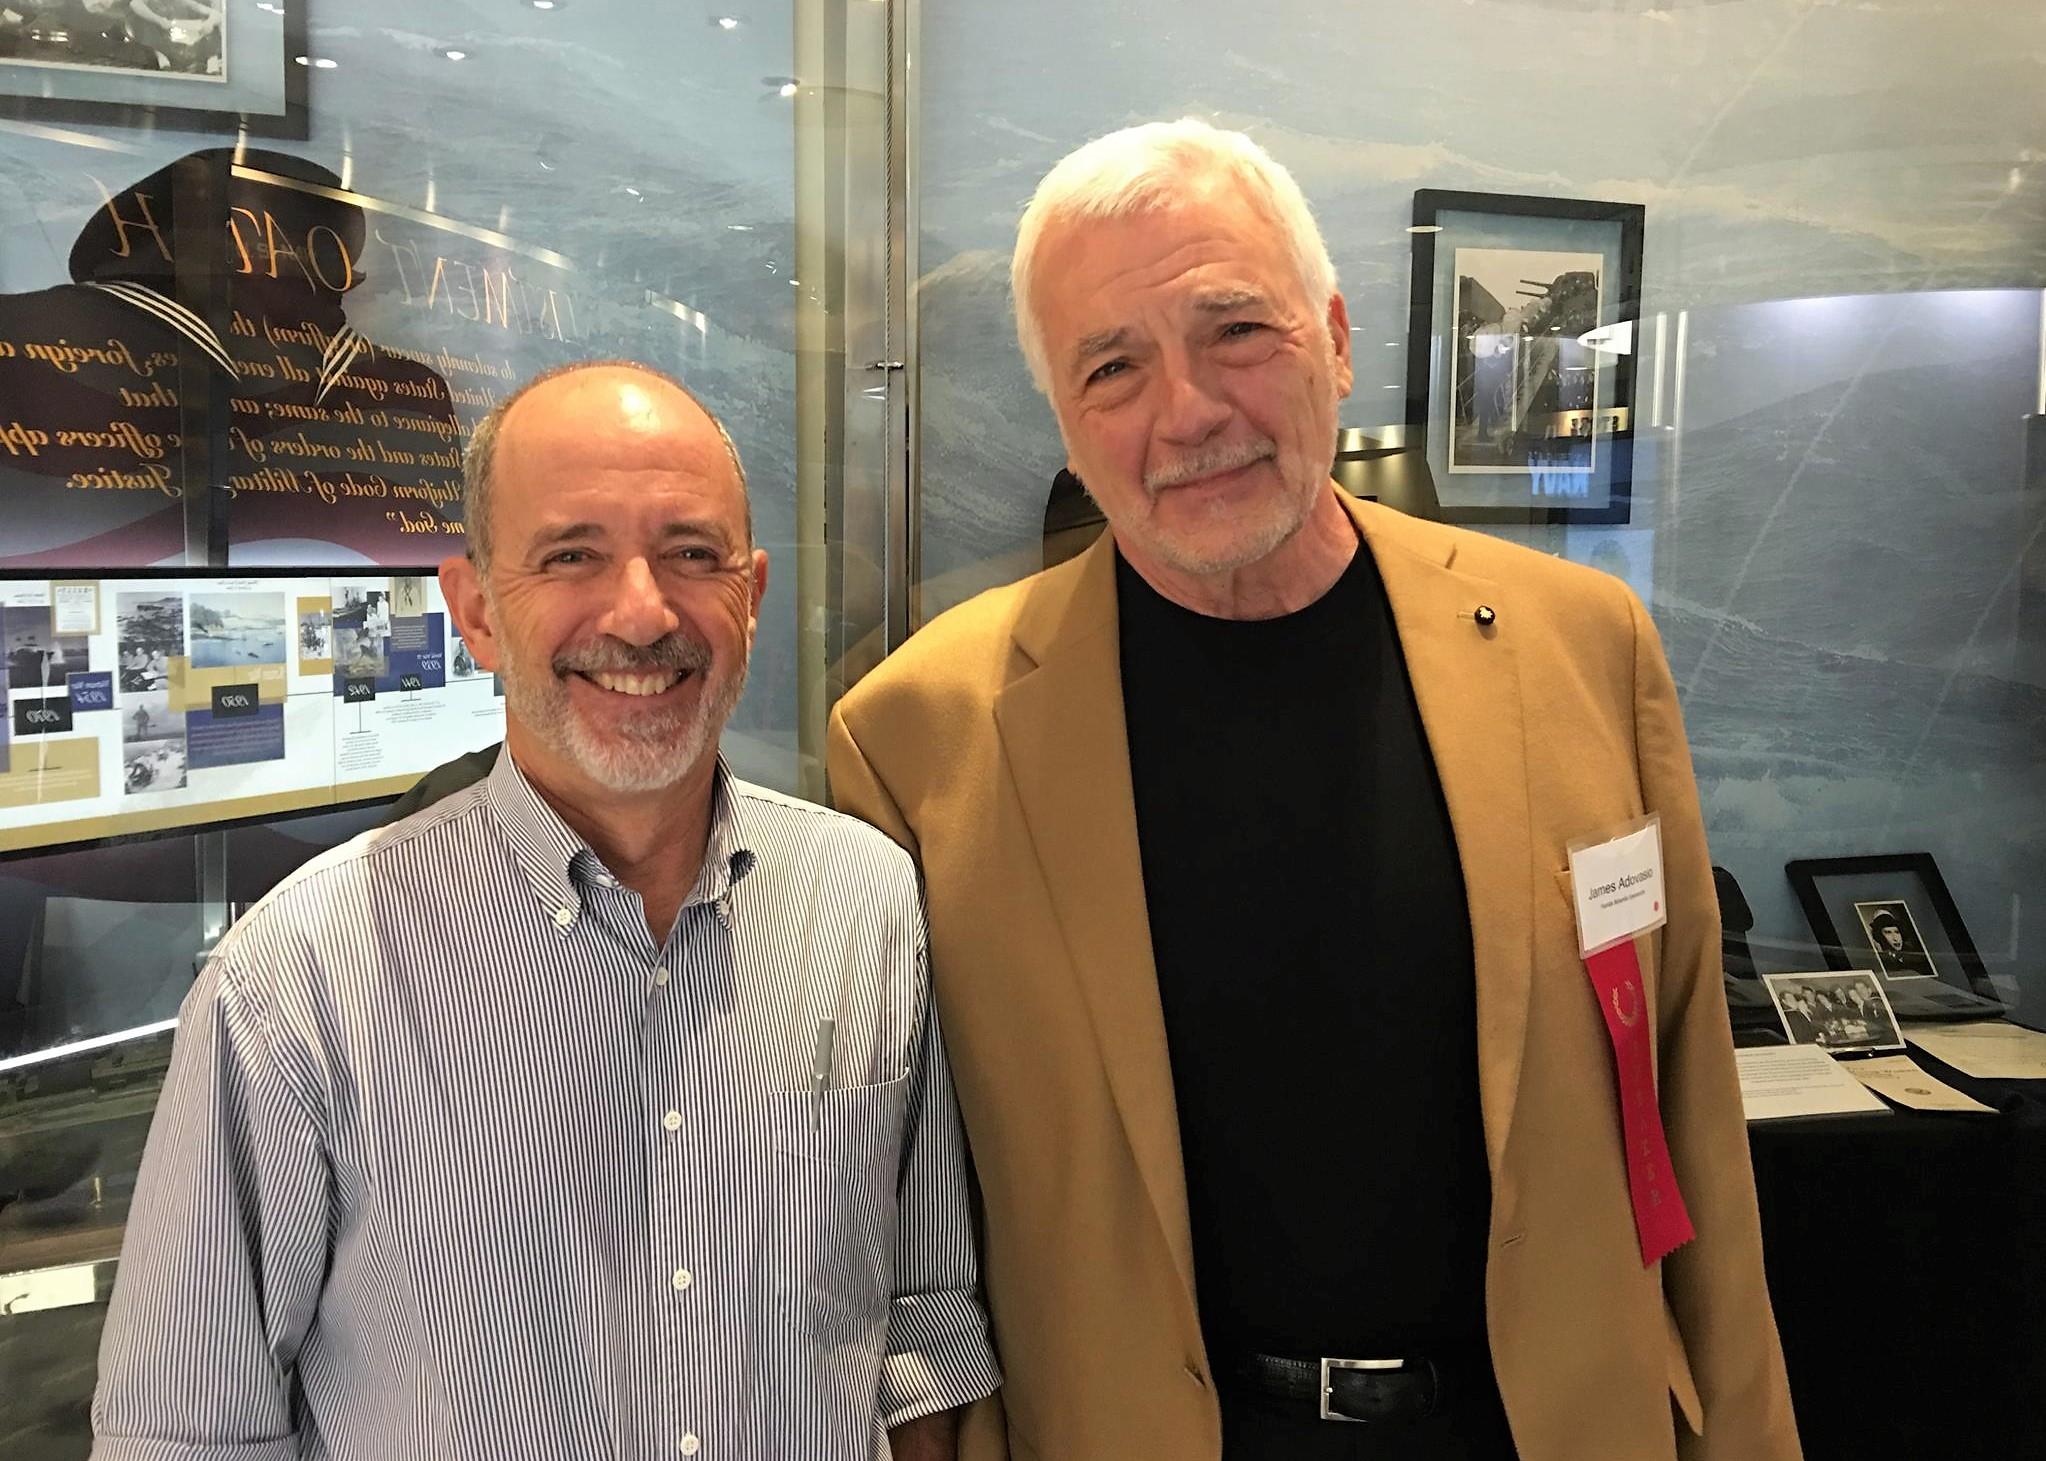 Steve Meltzer and James Adovasio.jpg